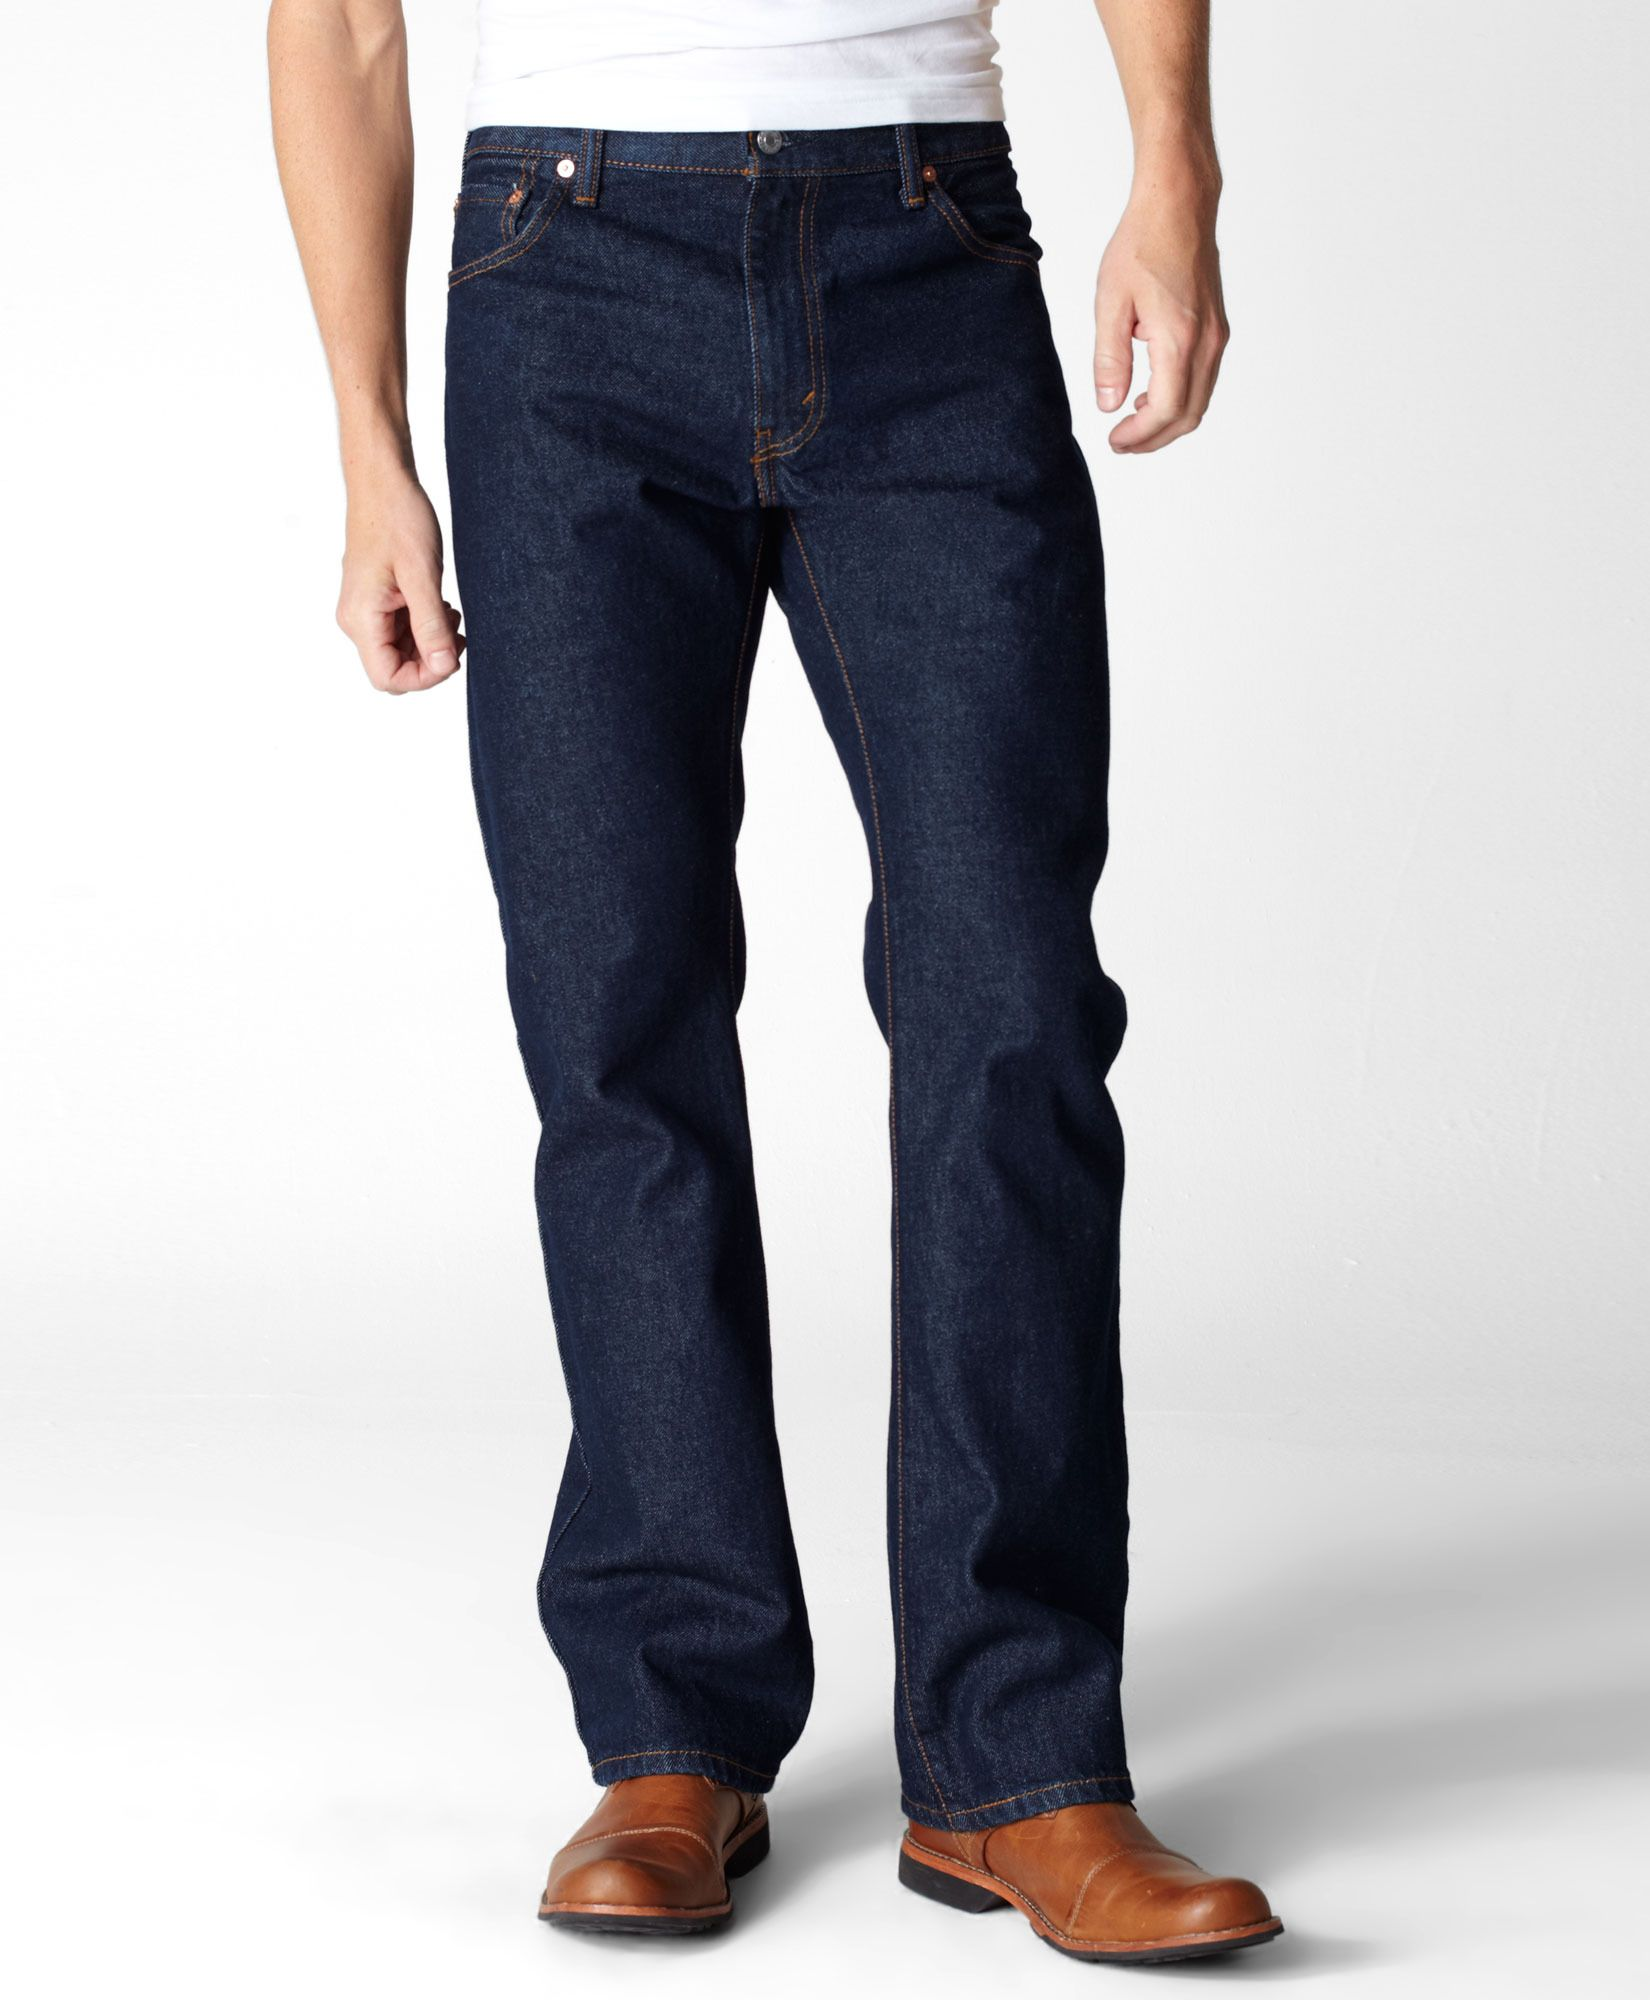 Mens jeans, Denim jeans